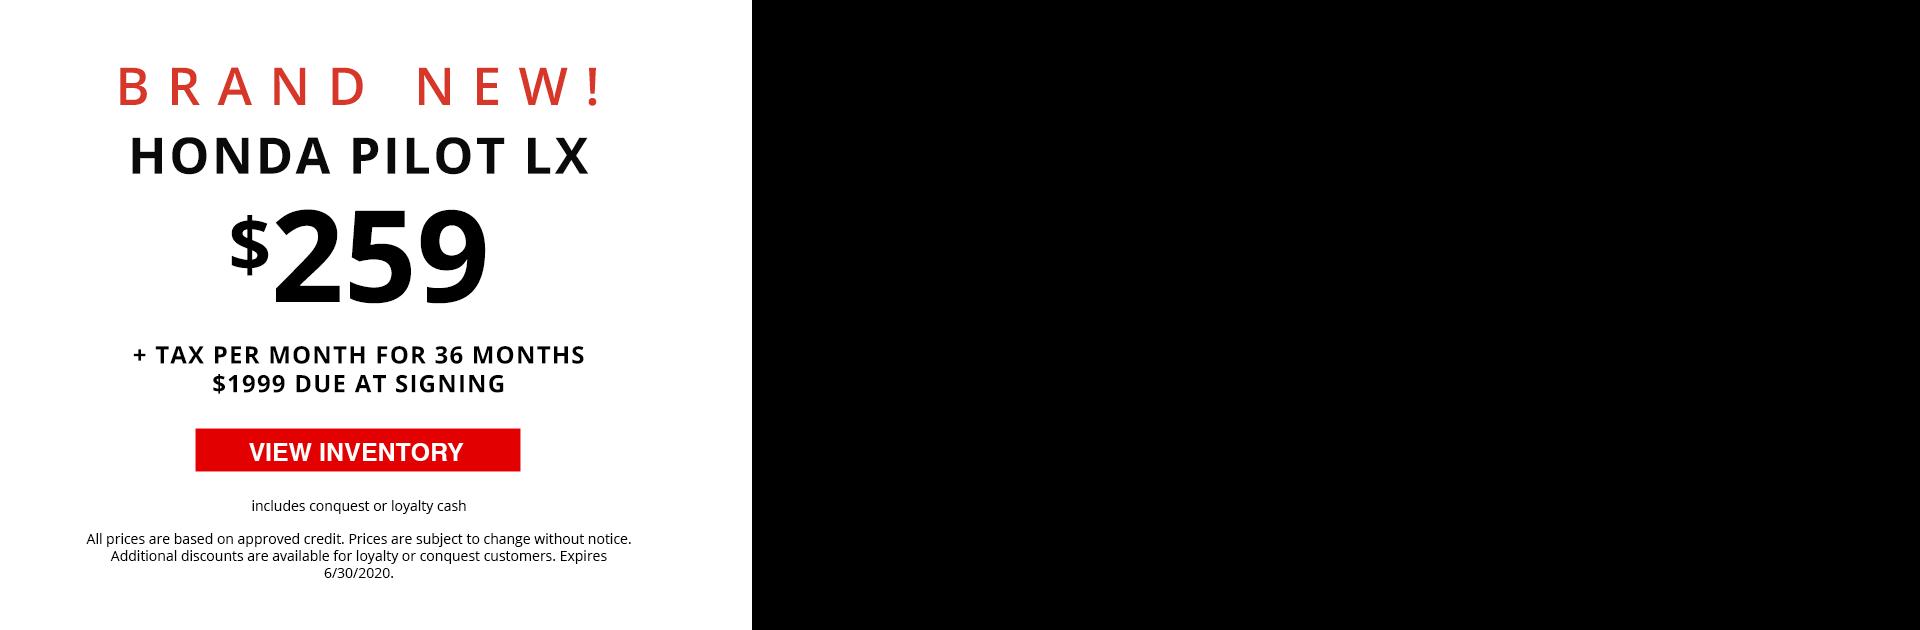 Video Banner - 2020 Honda Pilot LX